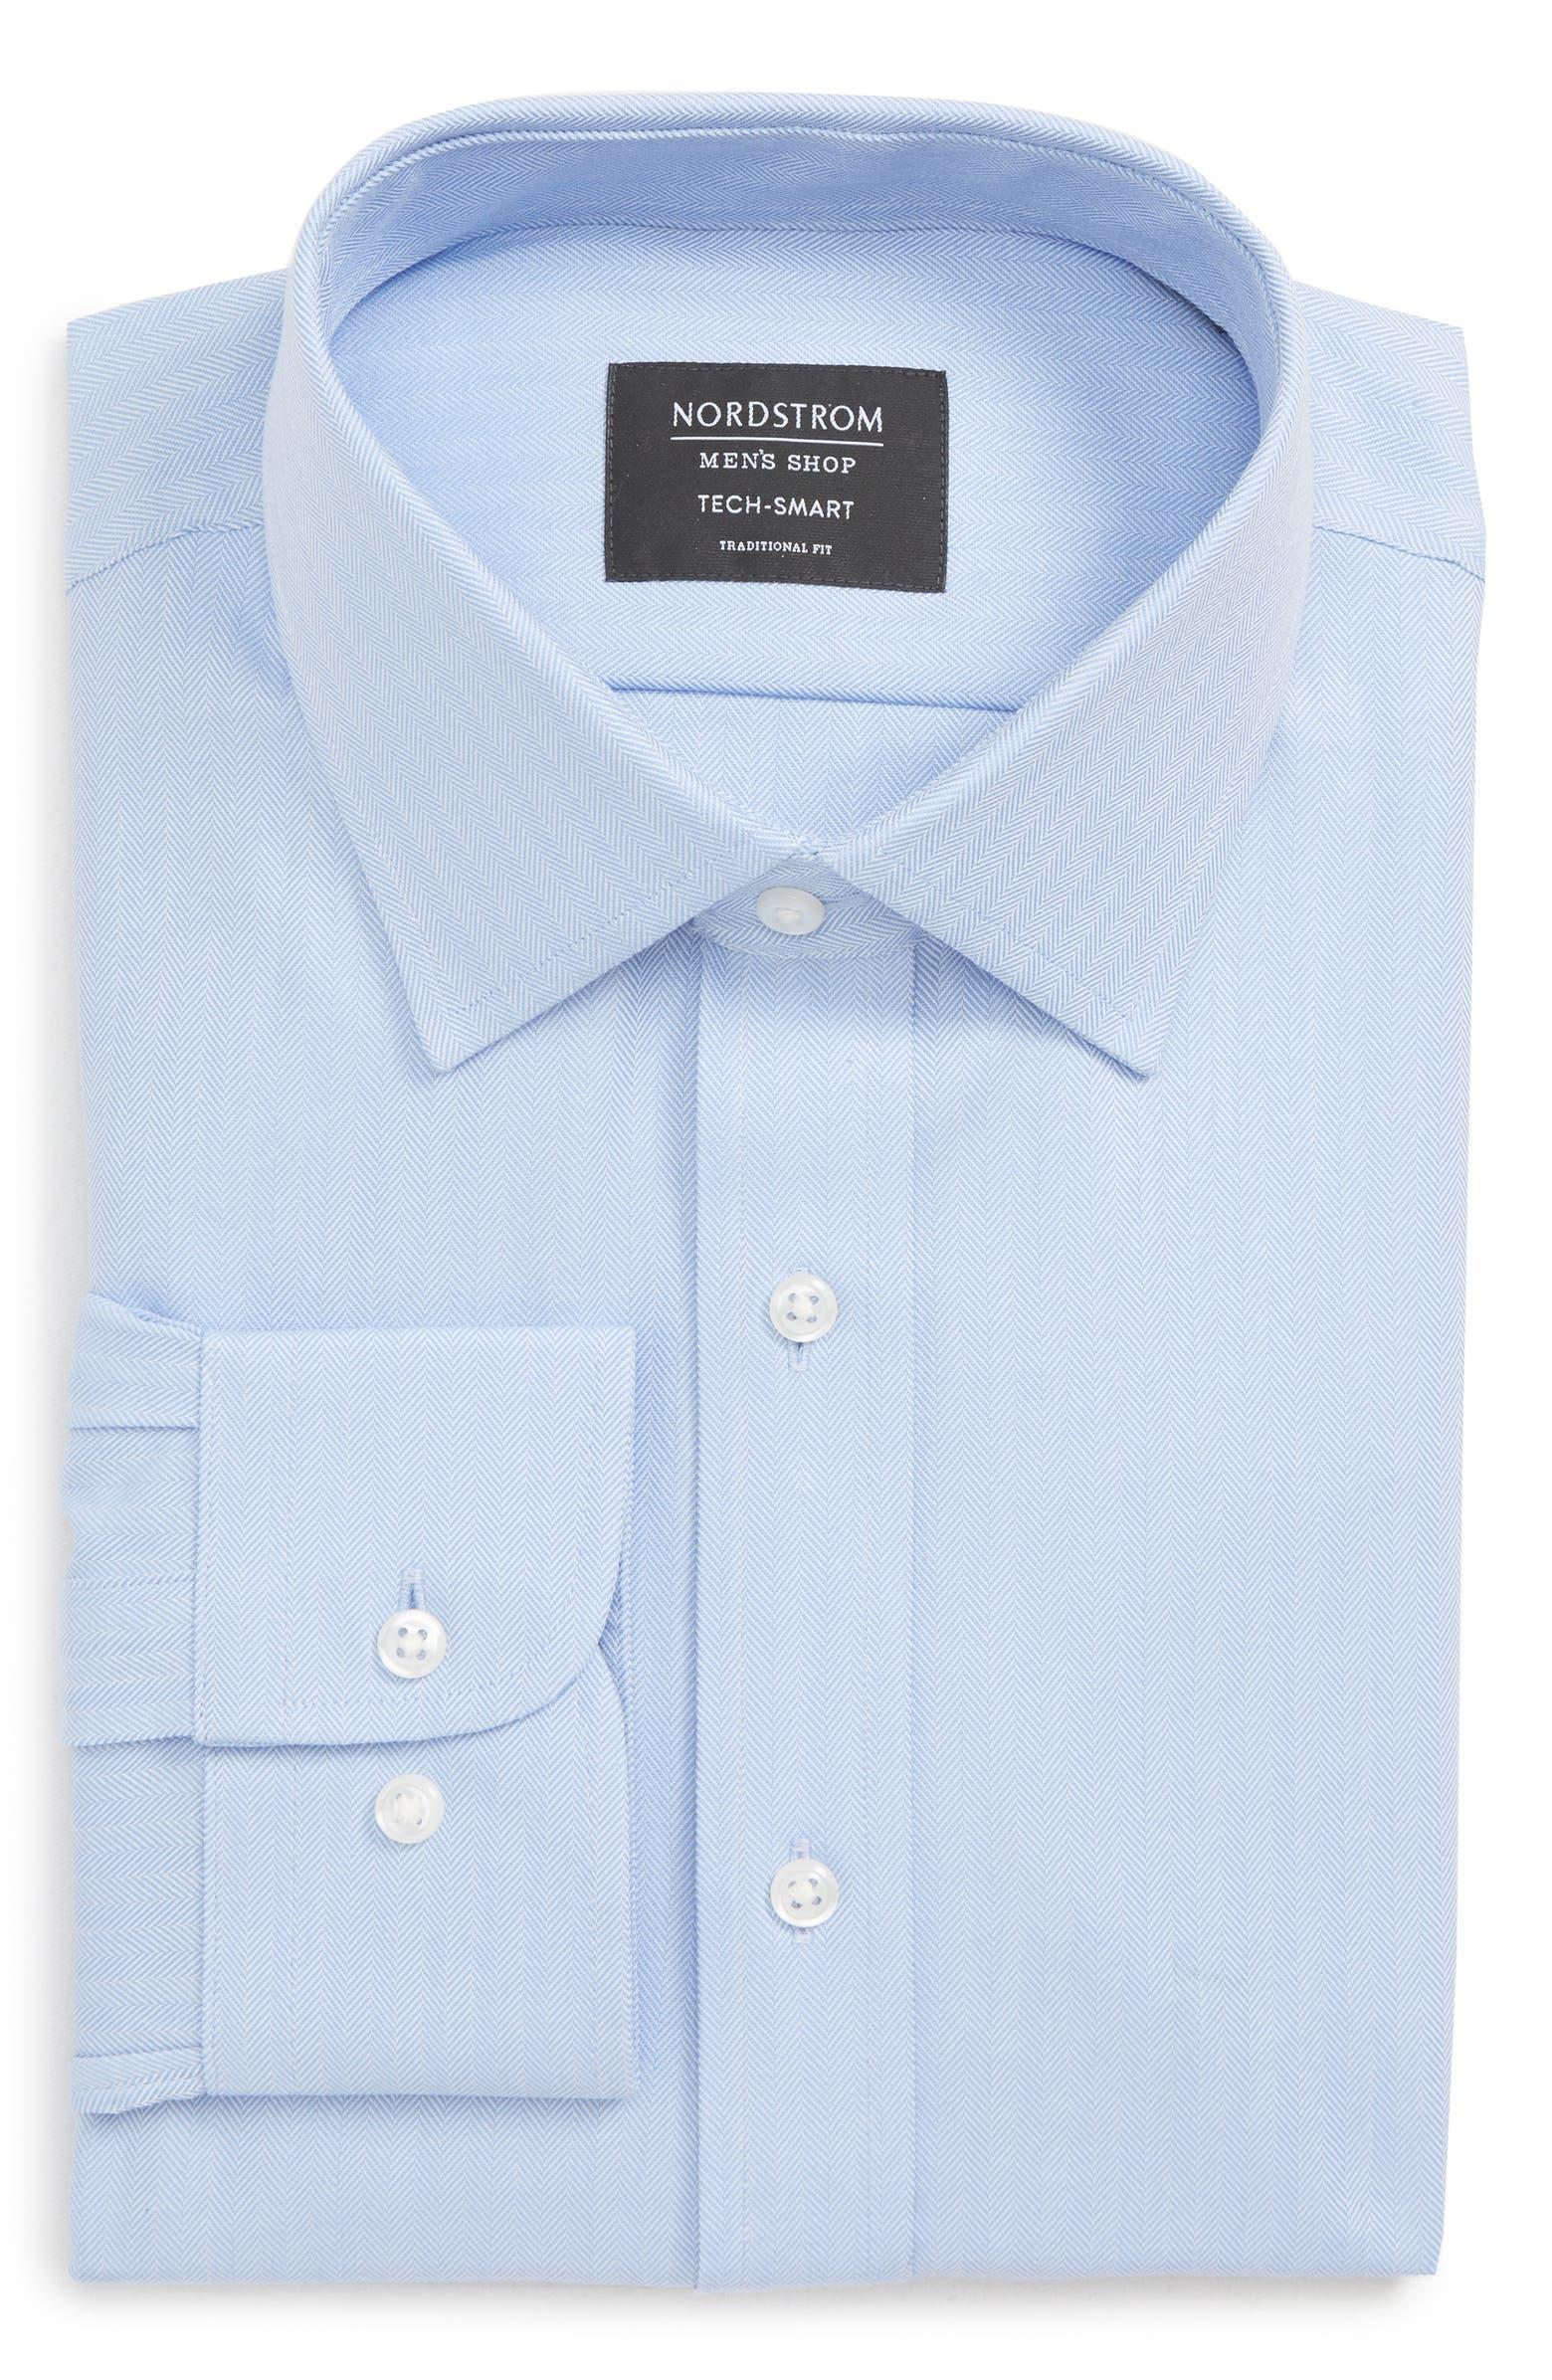 Tech-Smart Traditional Fit Stretch Herringbone Dress Shirt NORDSTROM MEN'S SHOP